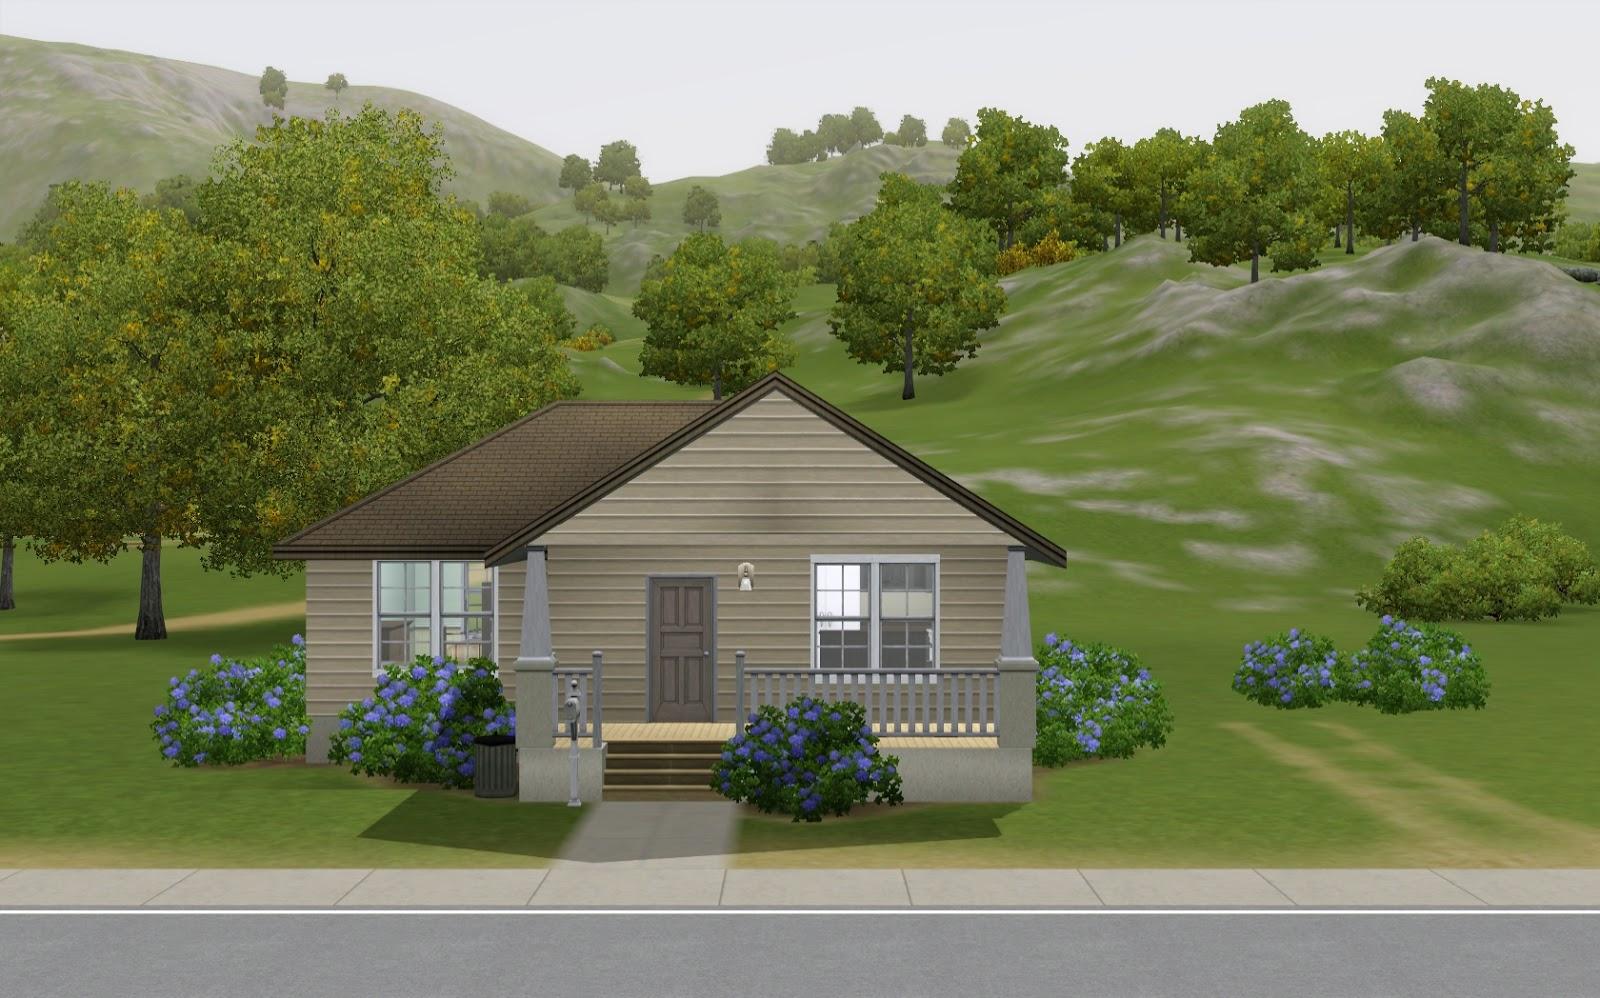 Summer S Little Sims 3 Garden Sims University The Sims 3